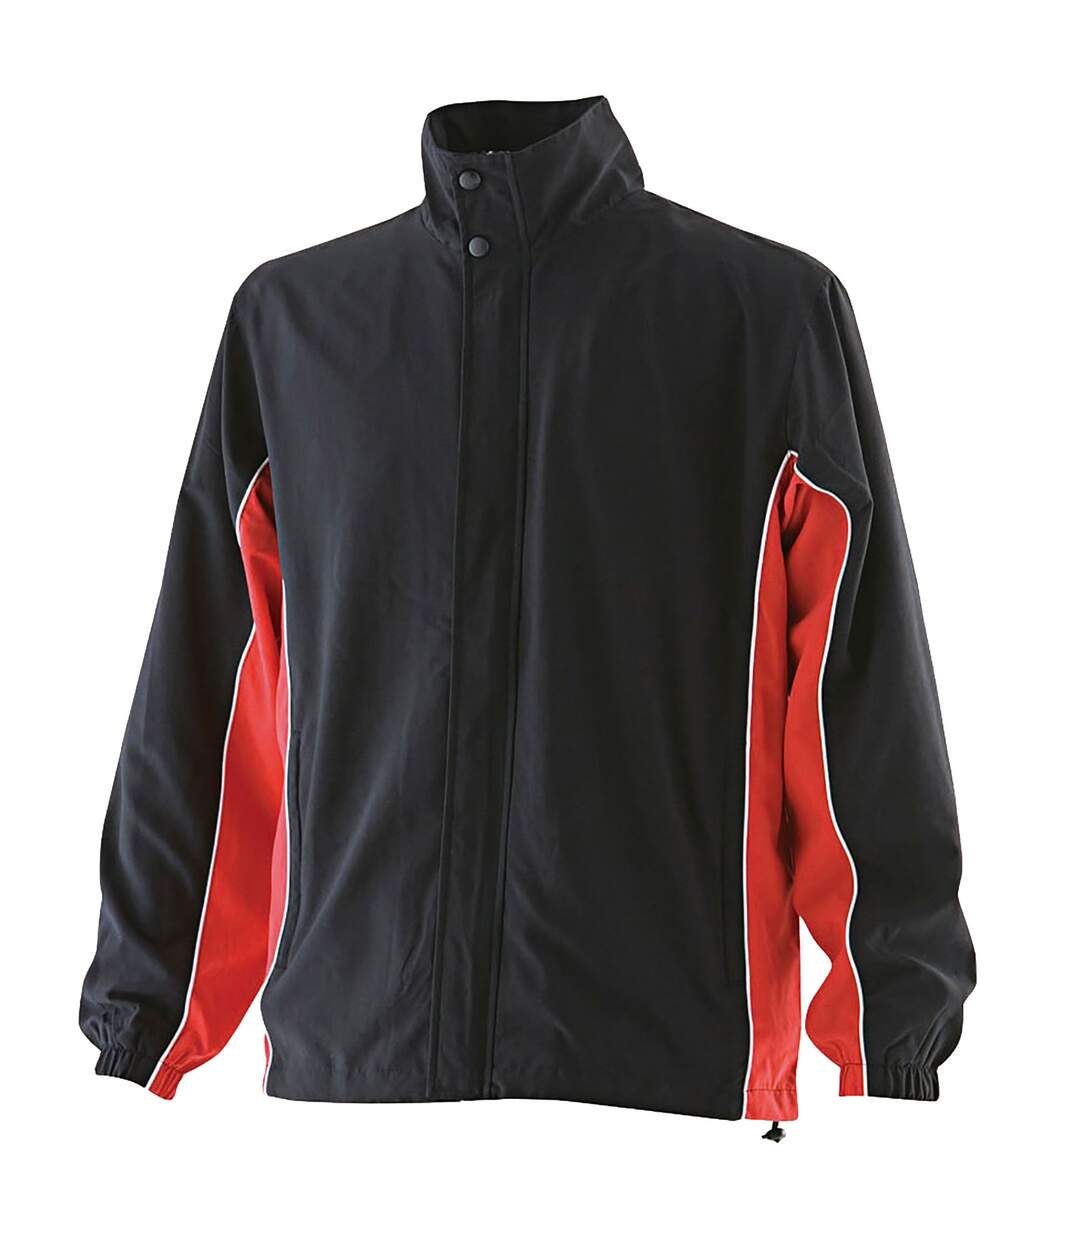 Finden & Hales Mens Contrast Full Zip Sport Track Top (Black/Red/White) - UTRW453